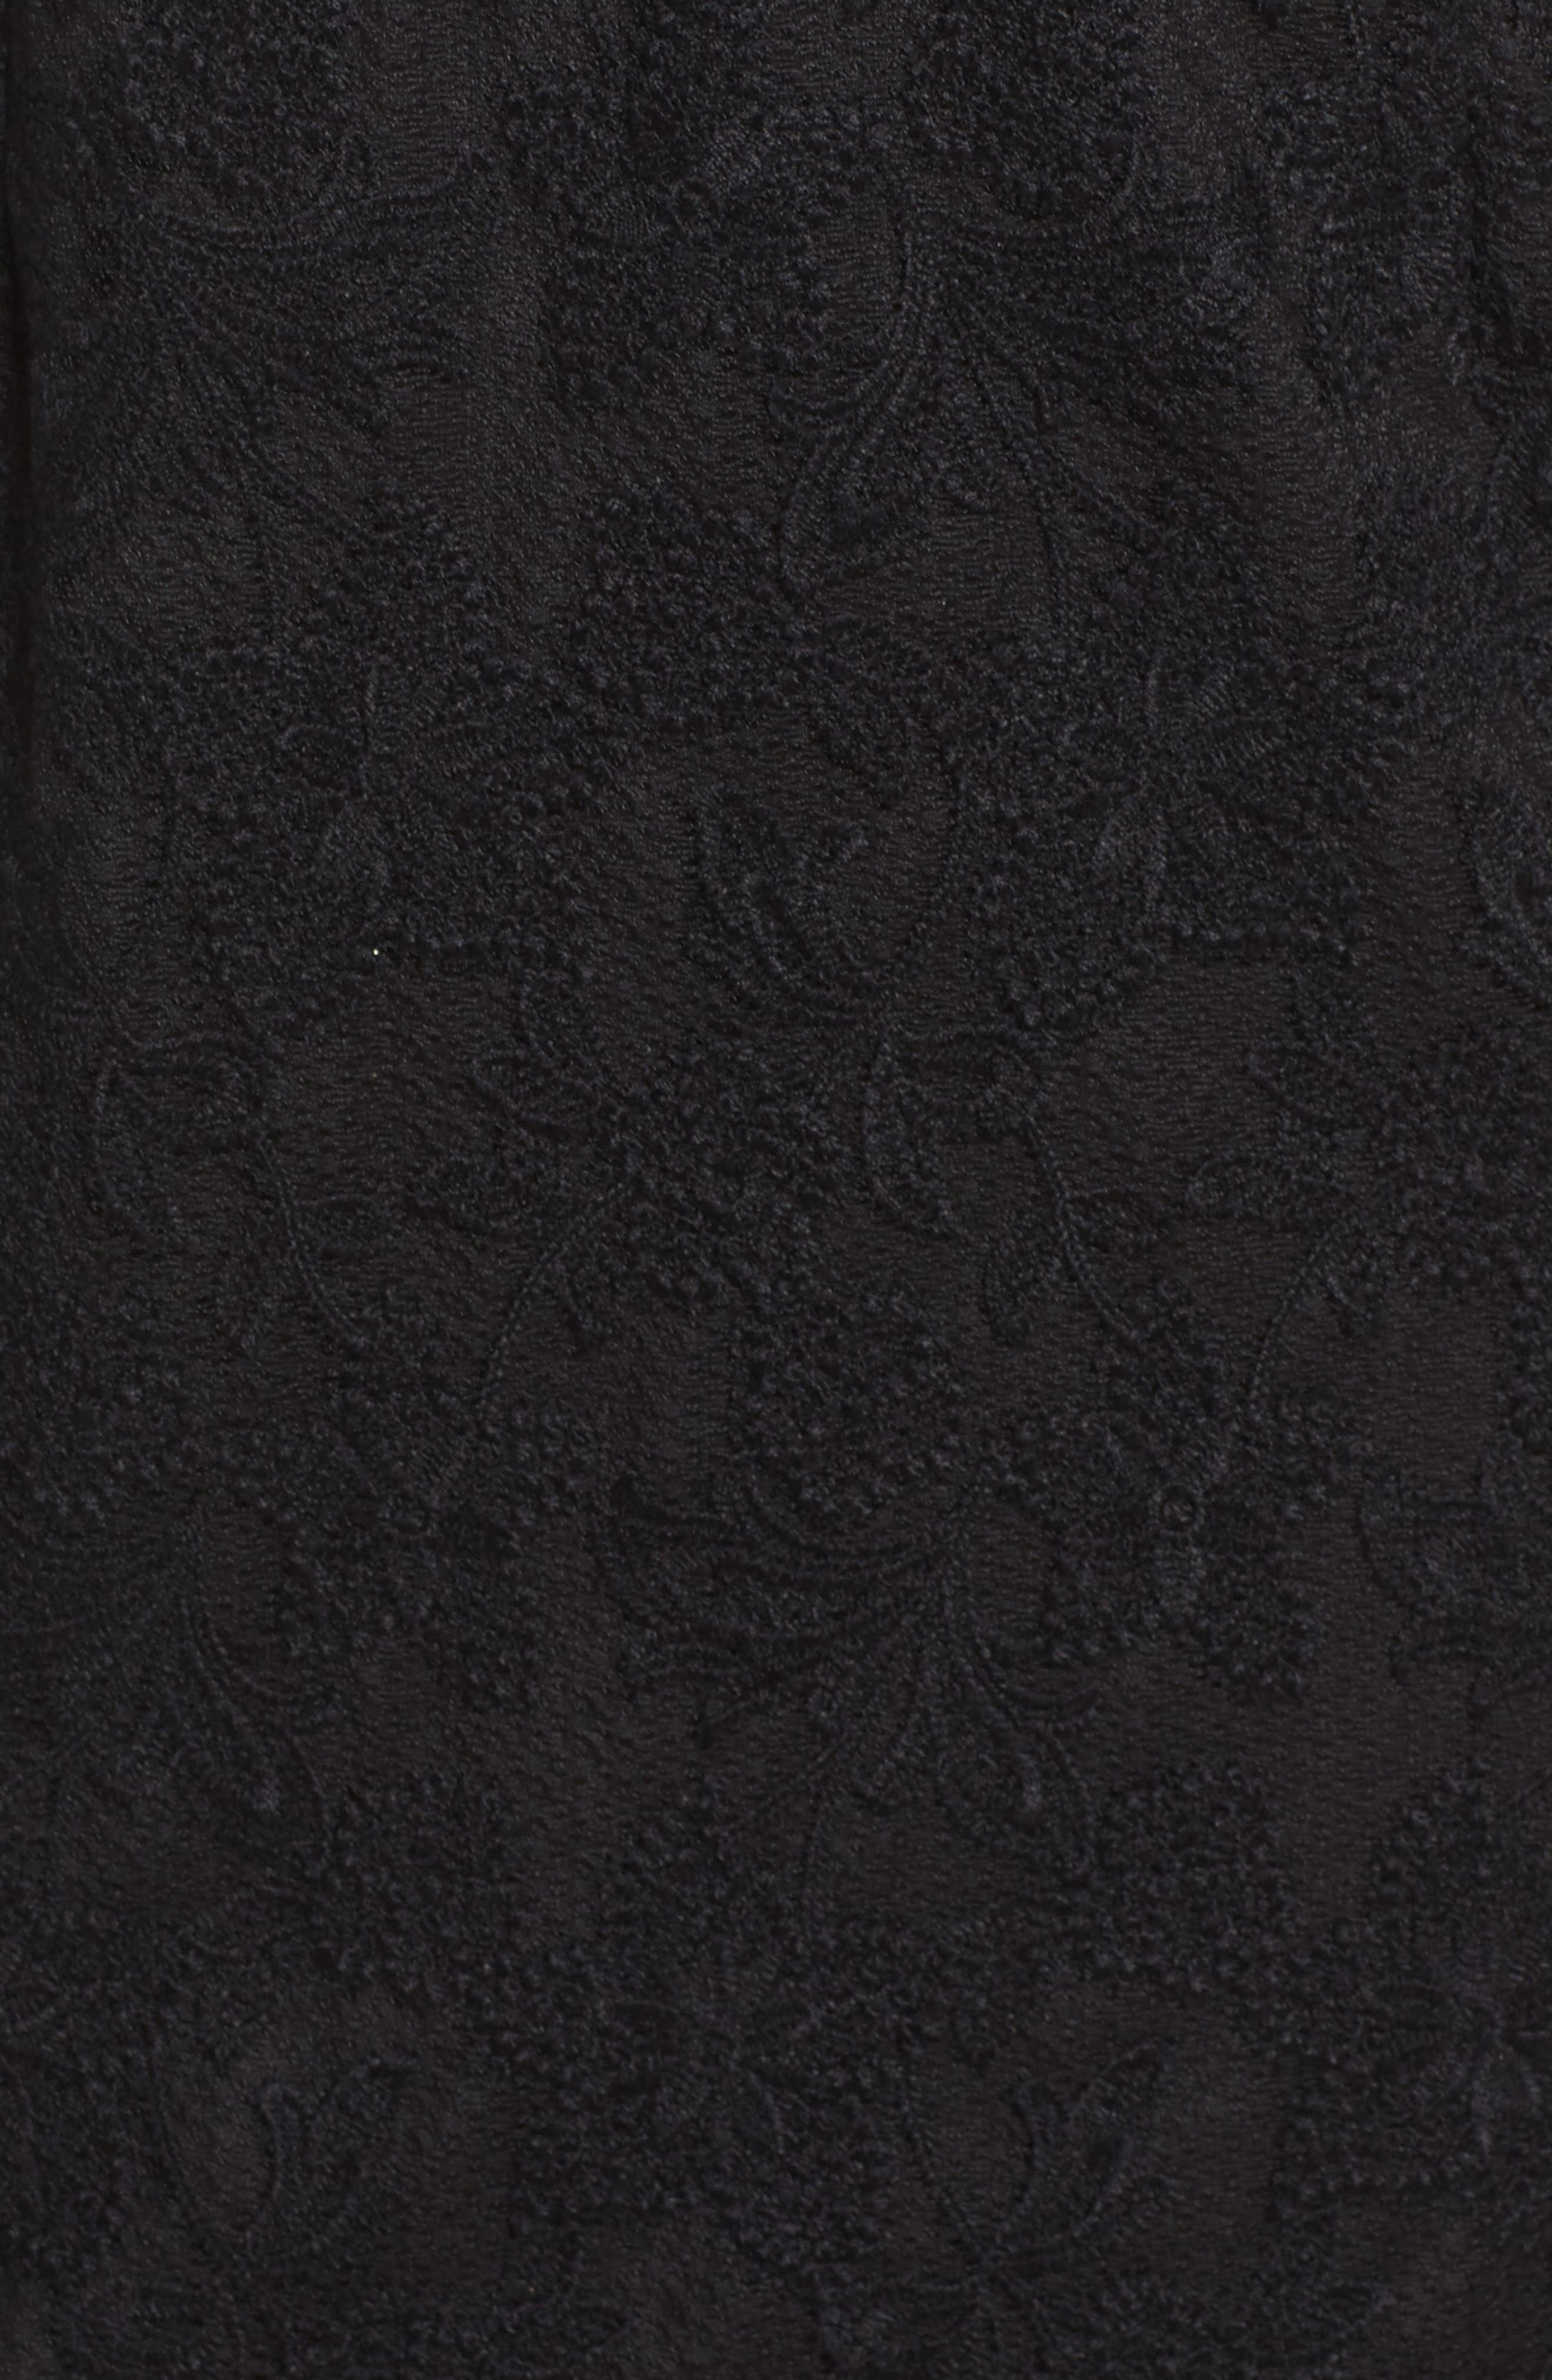 Salmone Lace Sheath Dress,                             Alternate thumbnail 5, color,                             Black/ Nude